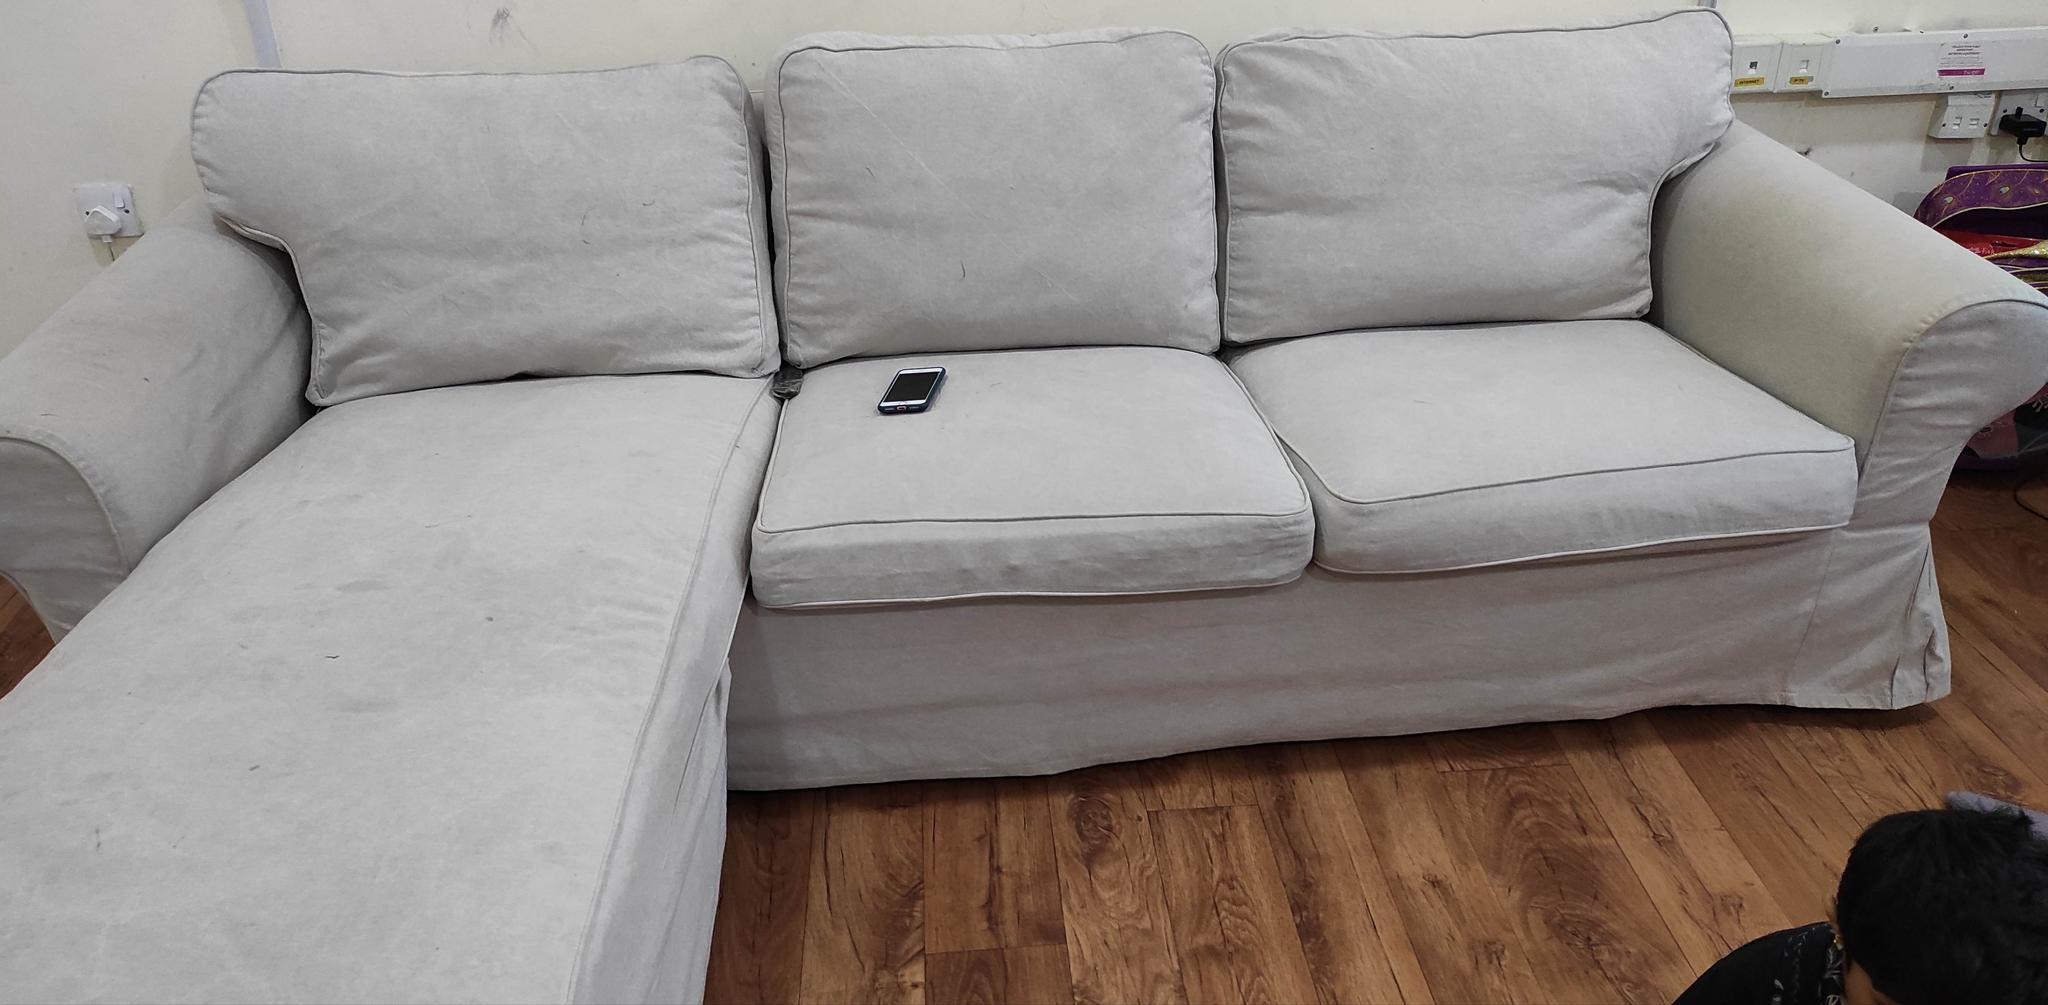 Ikea Ektorp 3 seat sofa for urgent sale